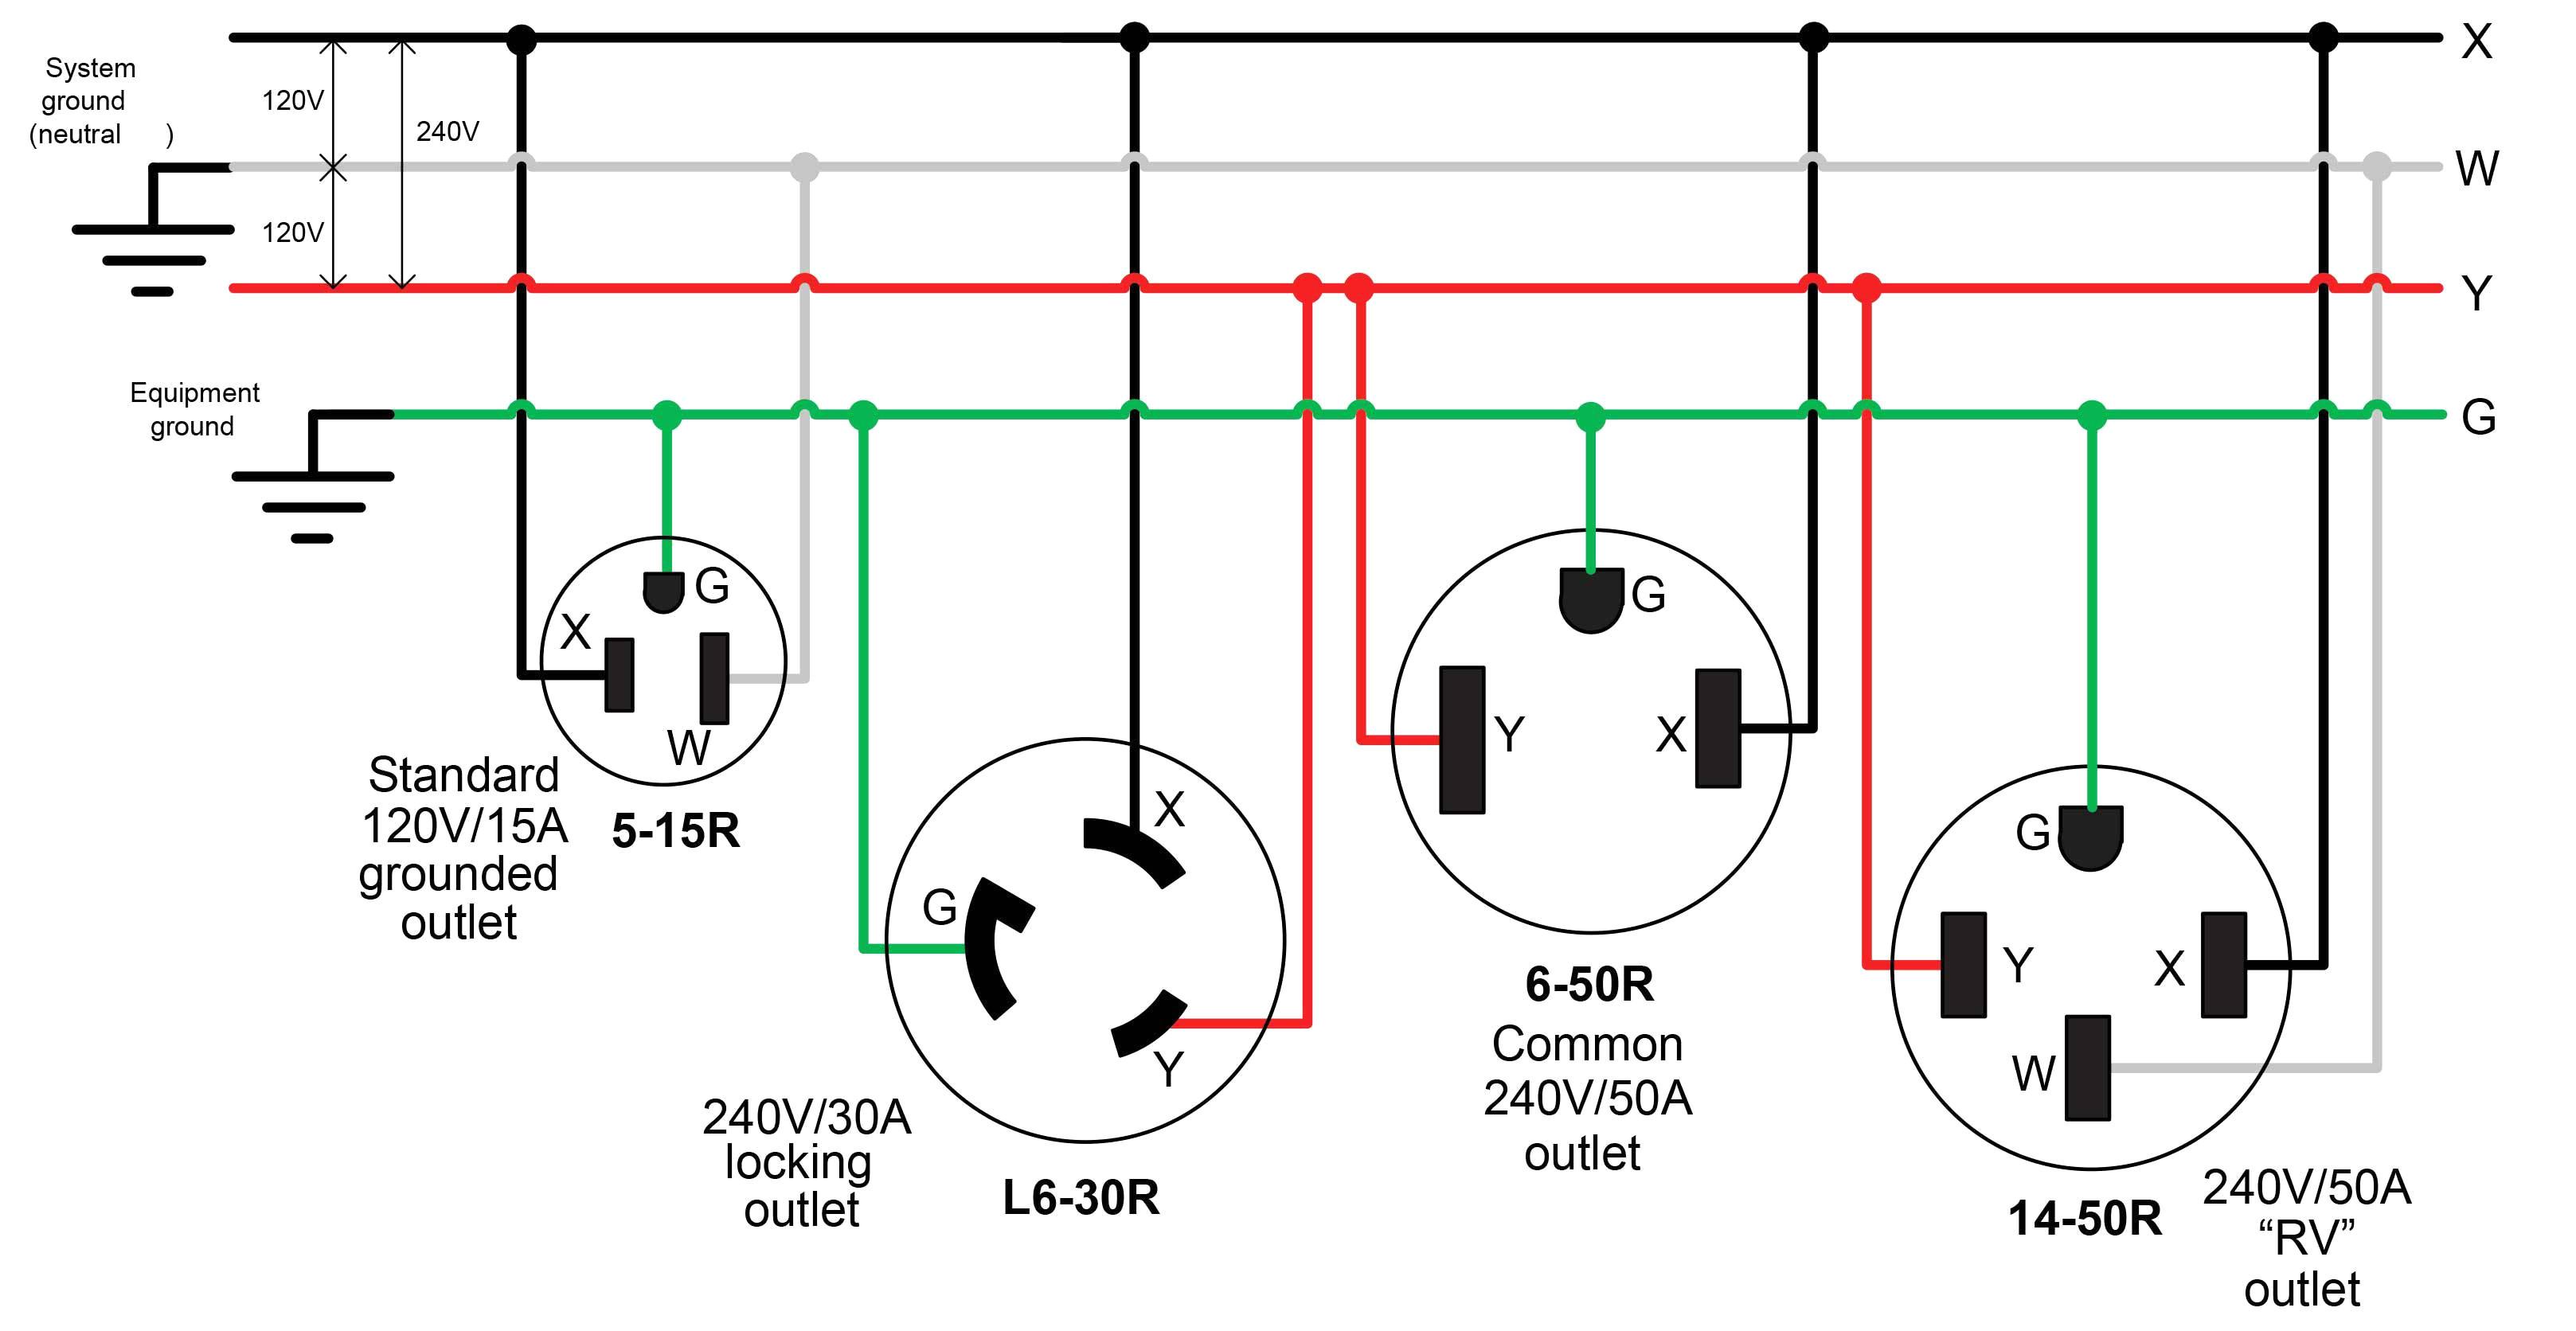 30 Amp Generator Diagram - Wiring Diagrams Hubs - 30 Amp Plug Wiring Diagram